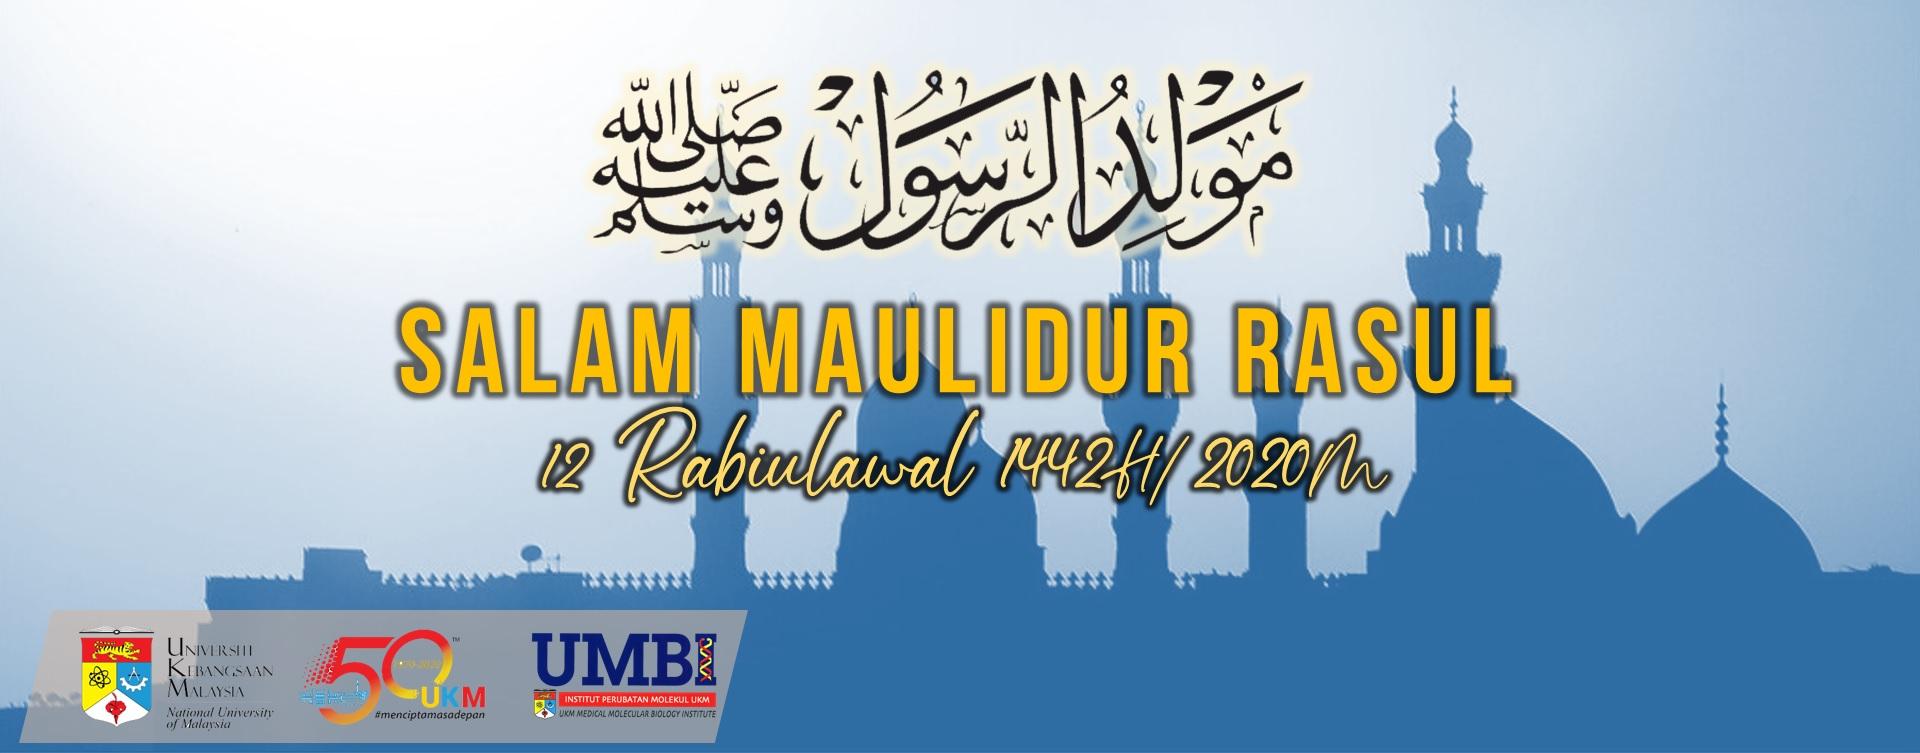 MAULIDUR RASUL 12 RABIULAWAL 1442H/2020M